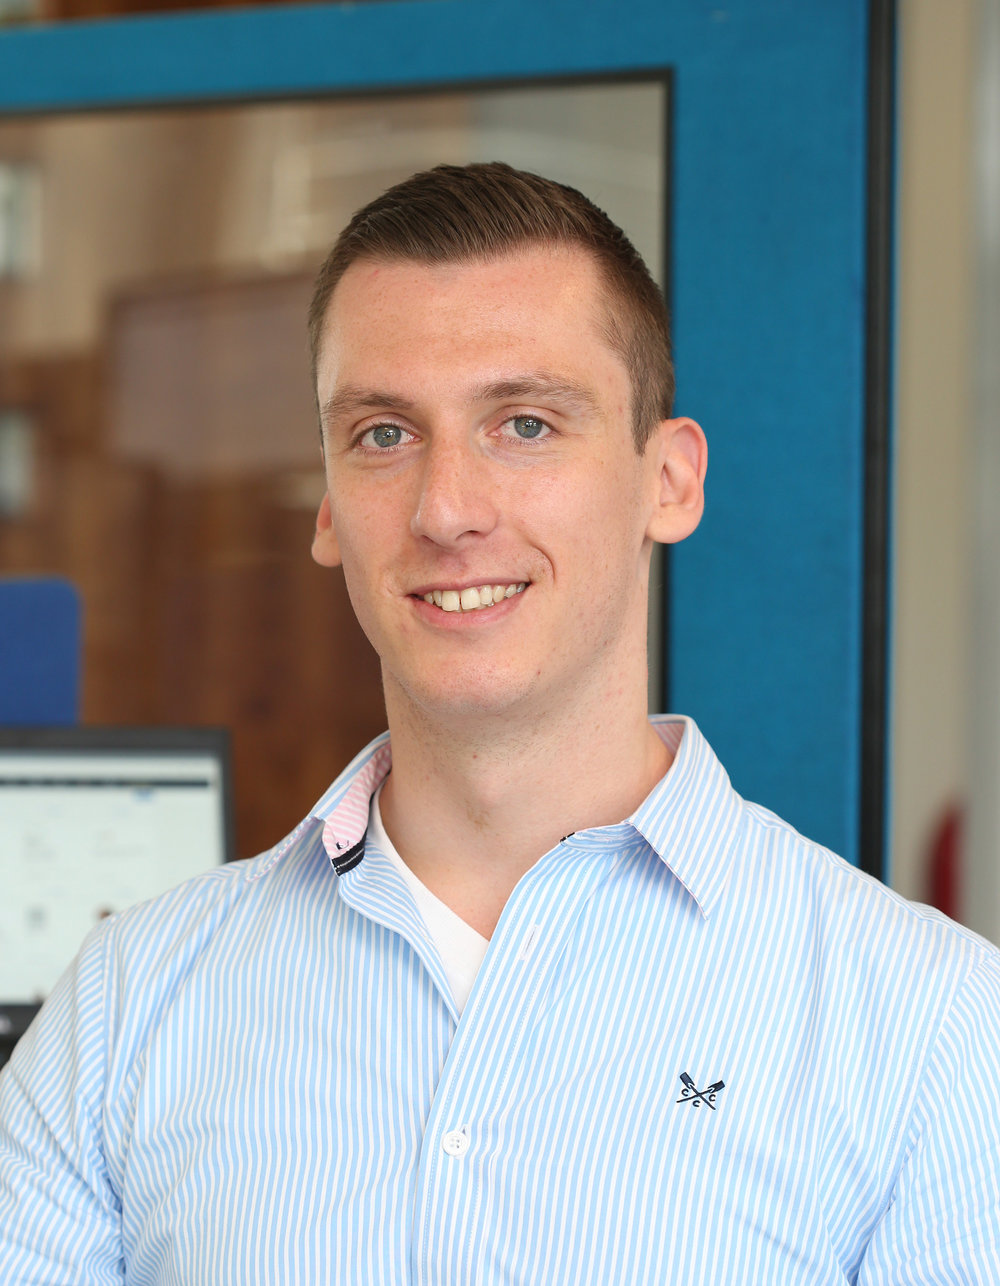 Oakstone International Andy Robsinson - Oakstone Recruitment Consultant